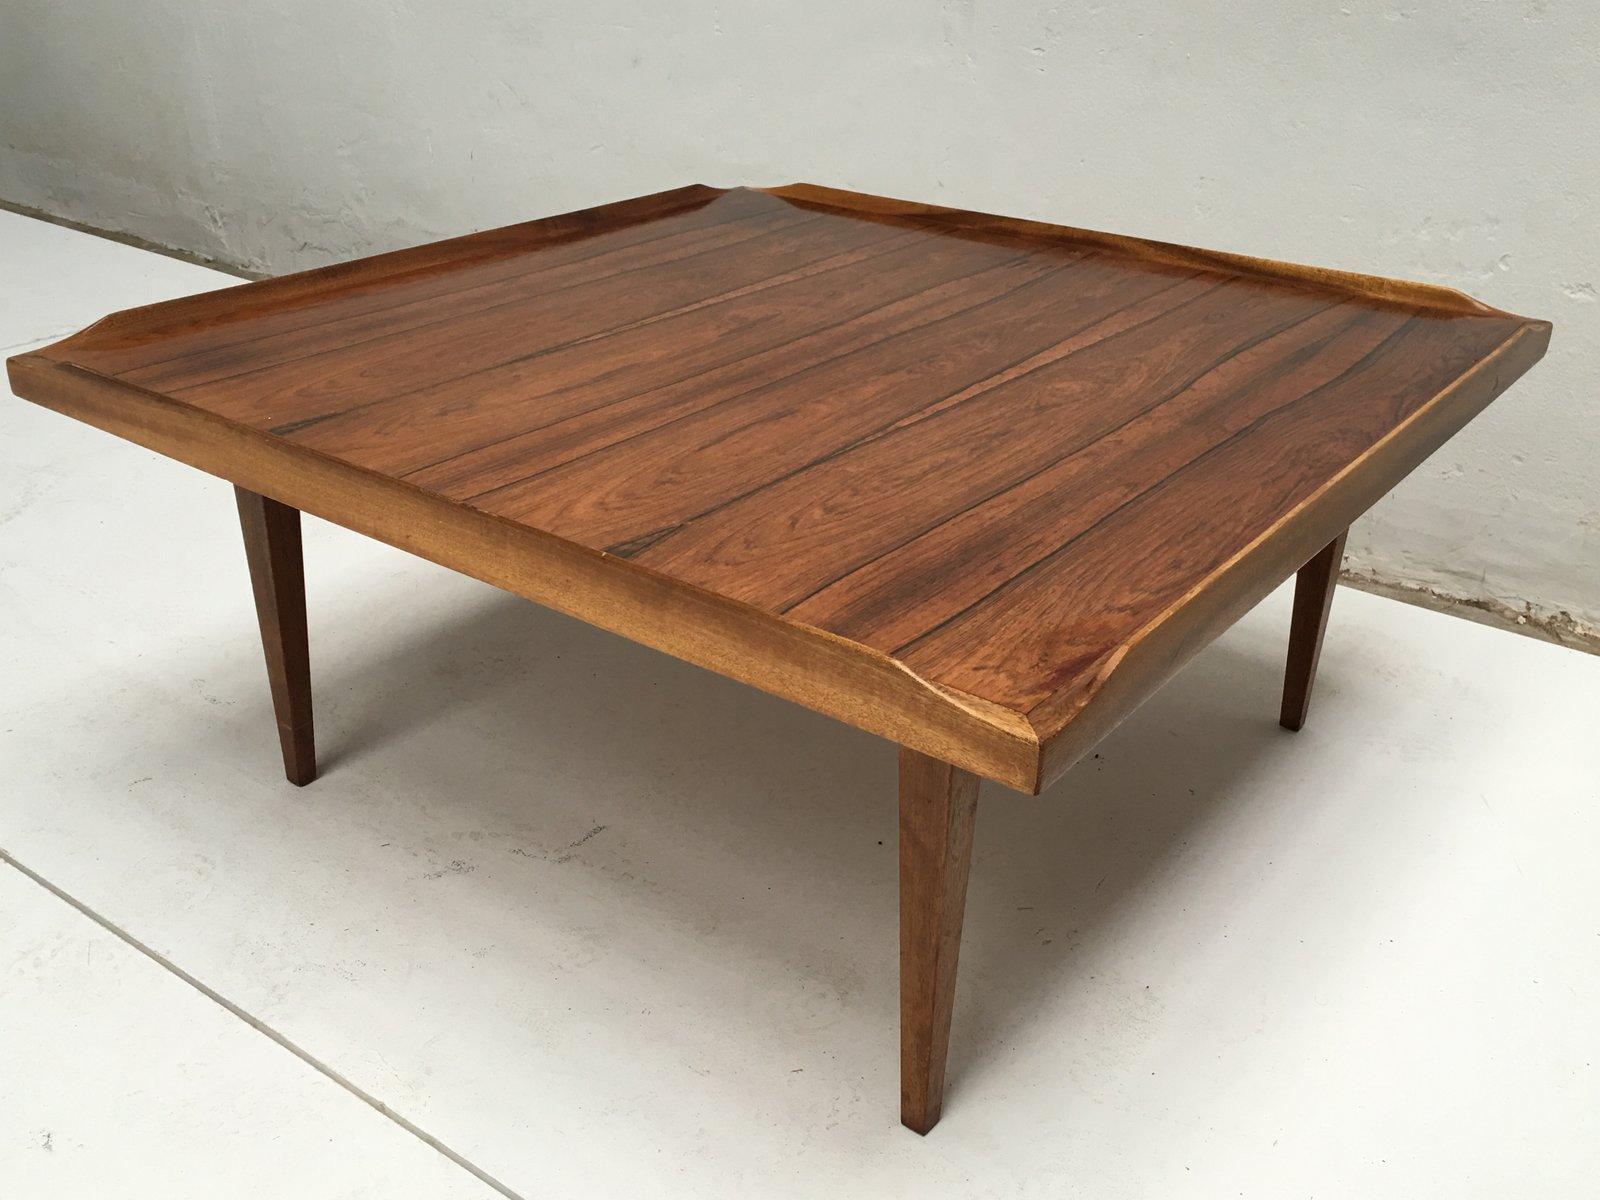 Wonderful Square Danish Rosewood Coffee Table, 1960s